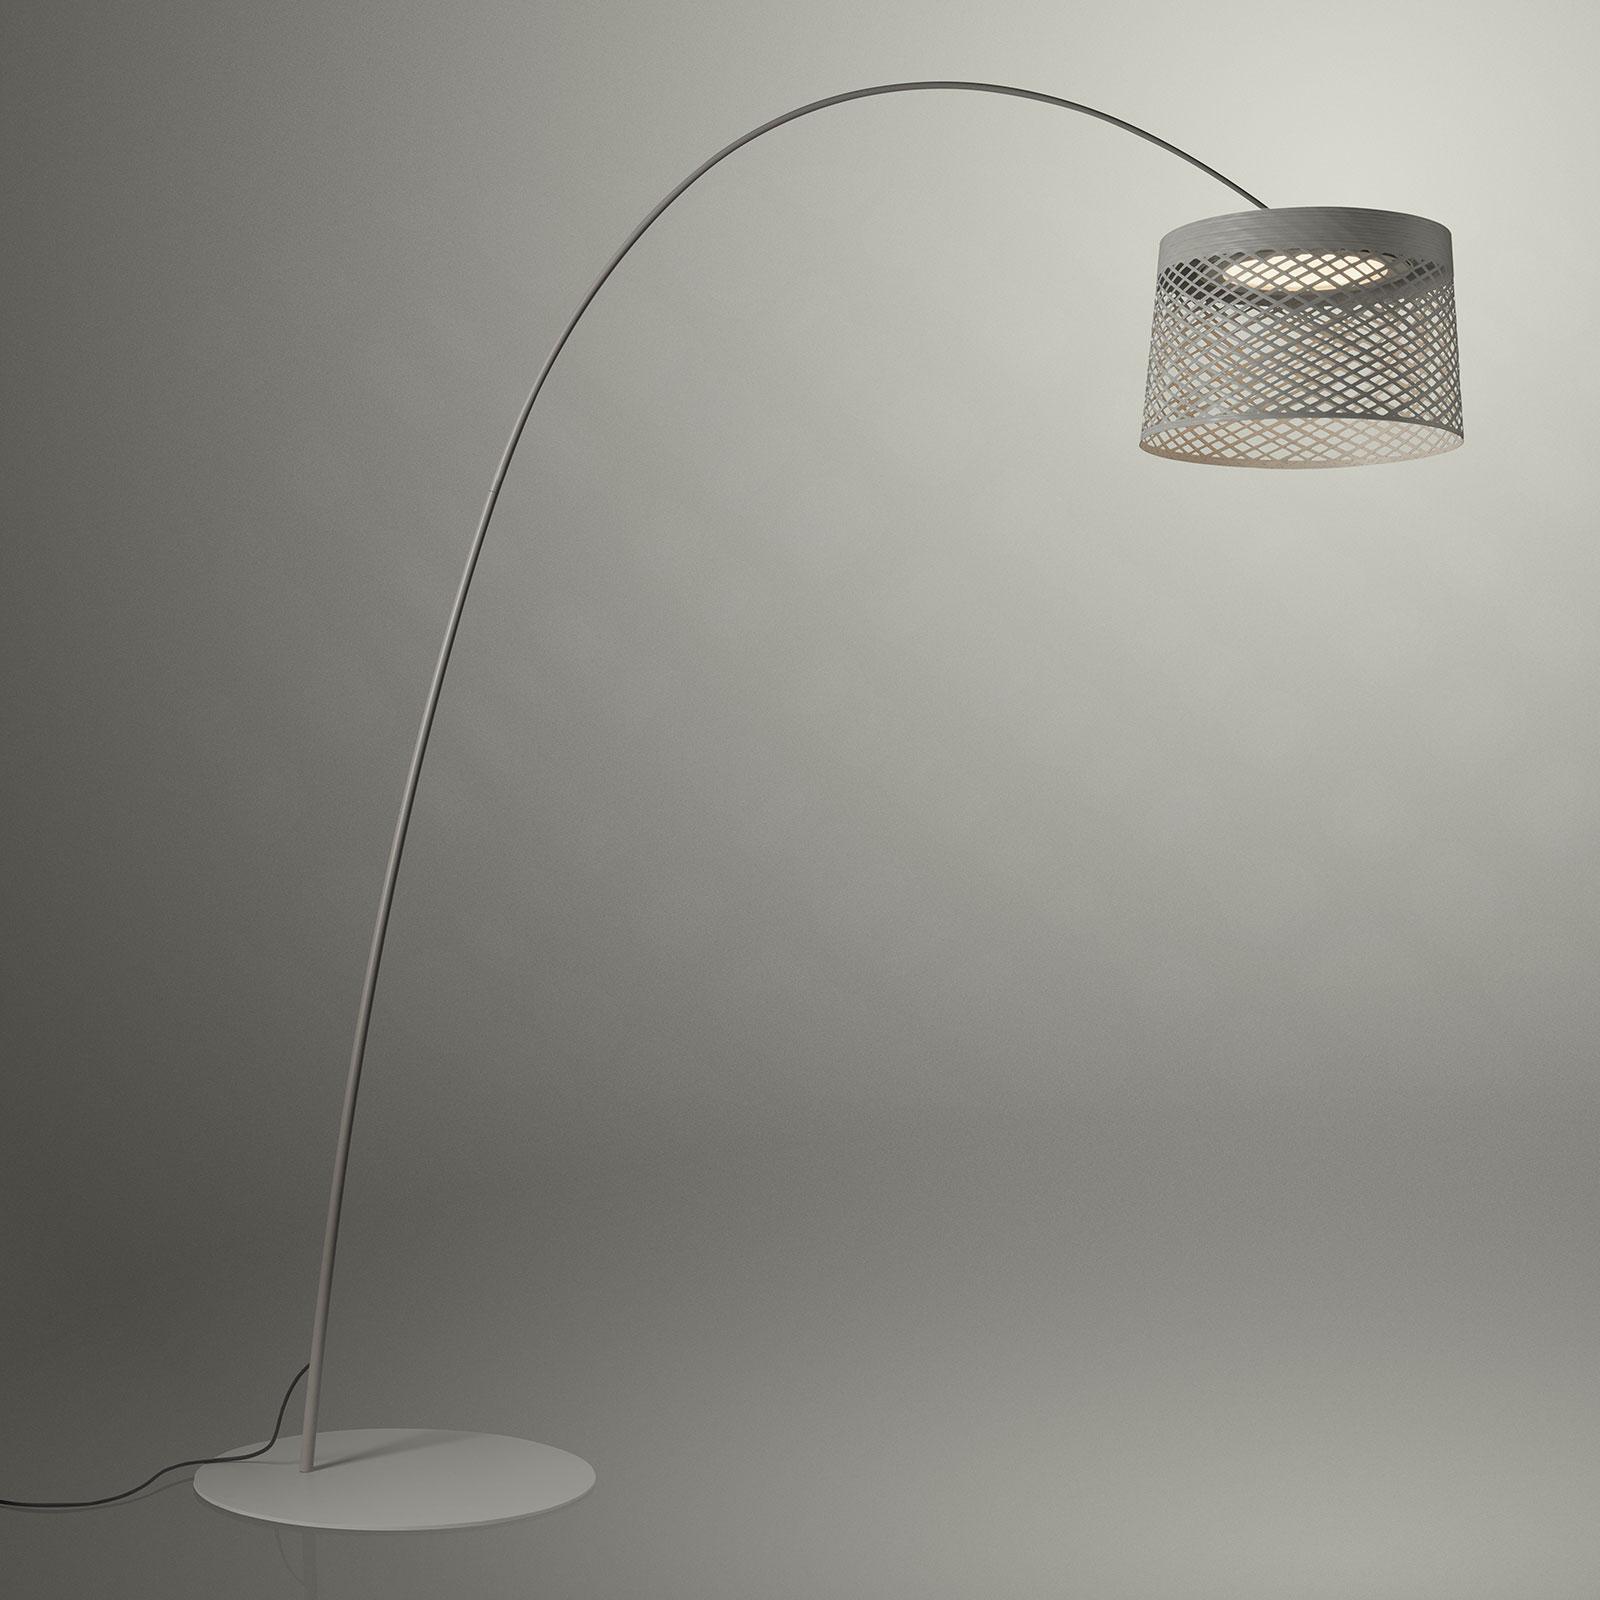 Foscarini Twiggy Grid lampa łukowa LED, greige